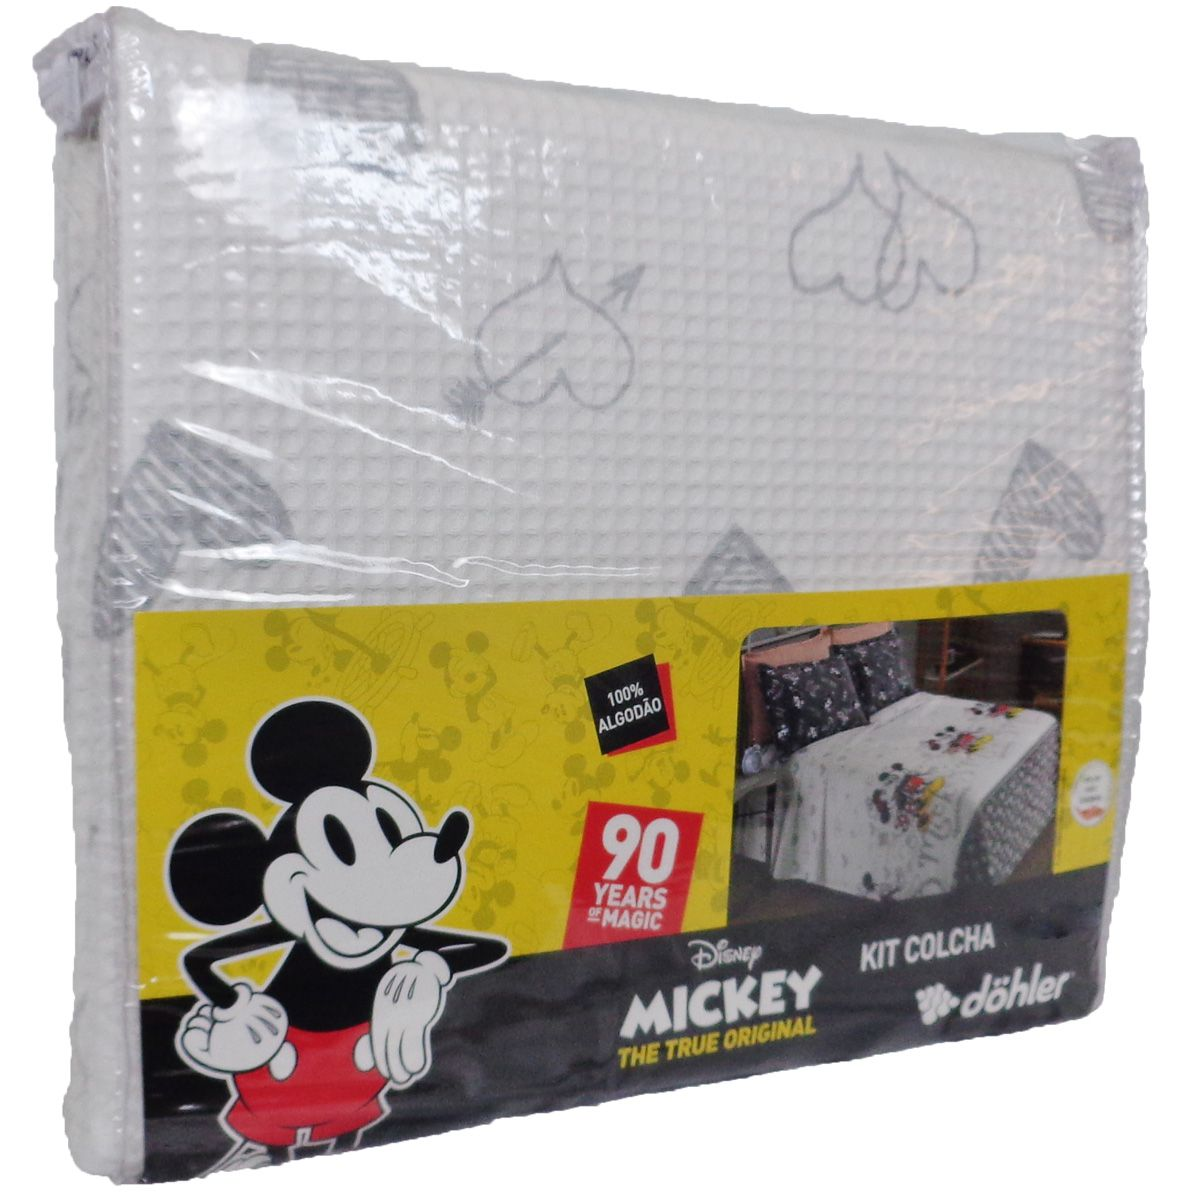 Kit Colcha Casal Piquet Mickey E Minnie 3 Peças Algodão Dohler